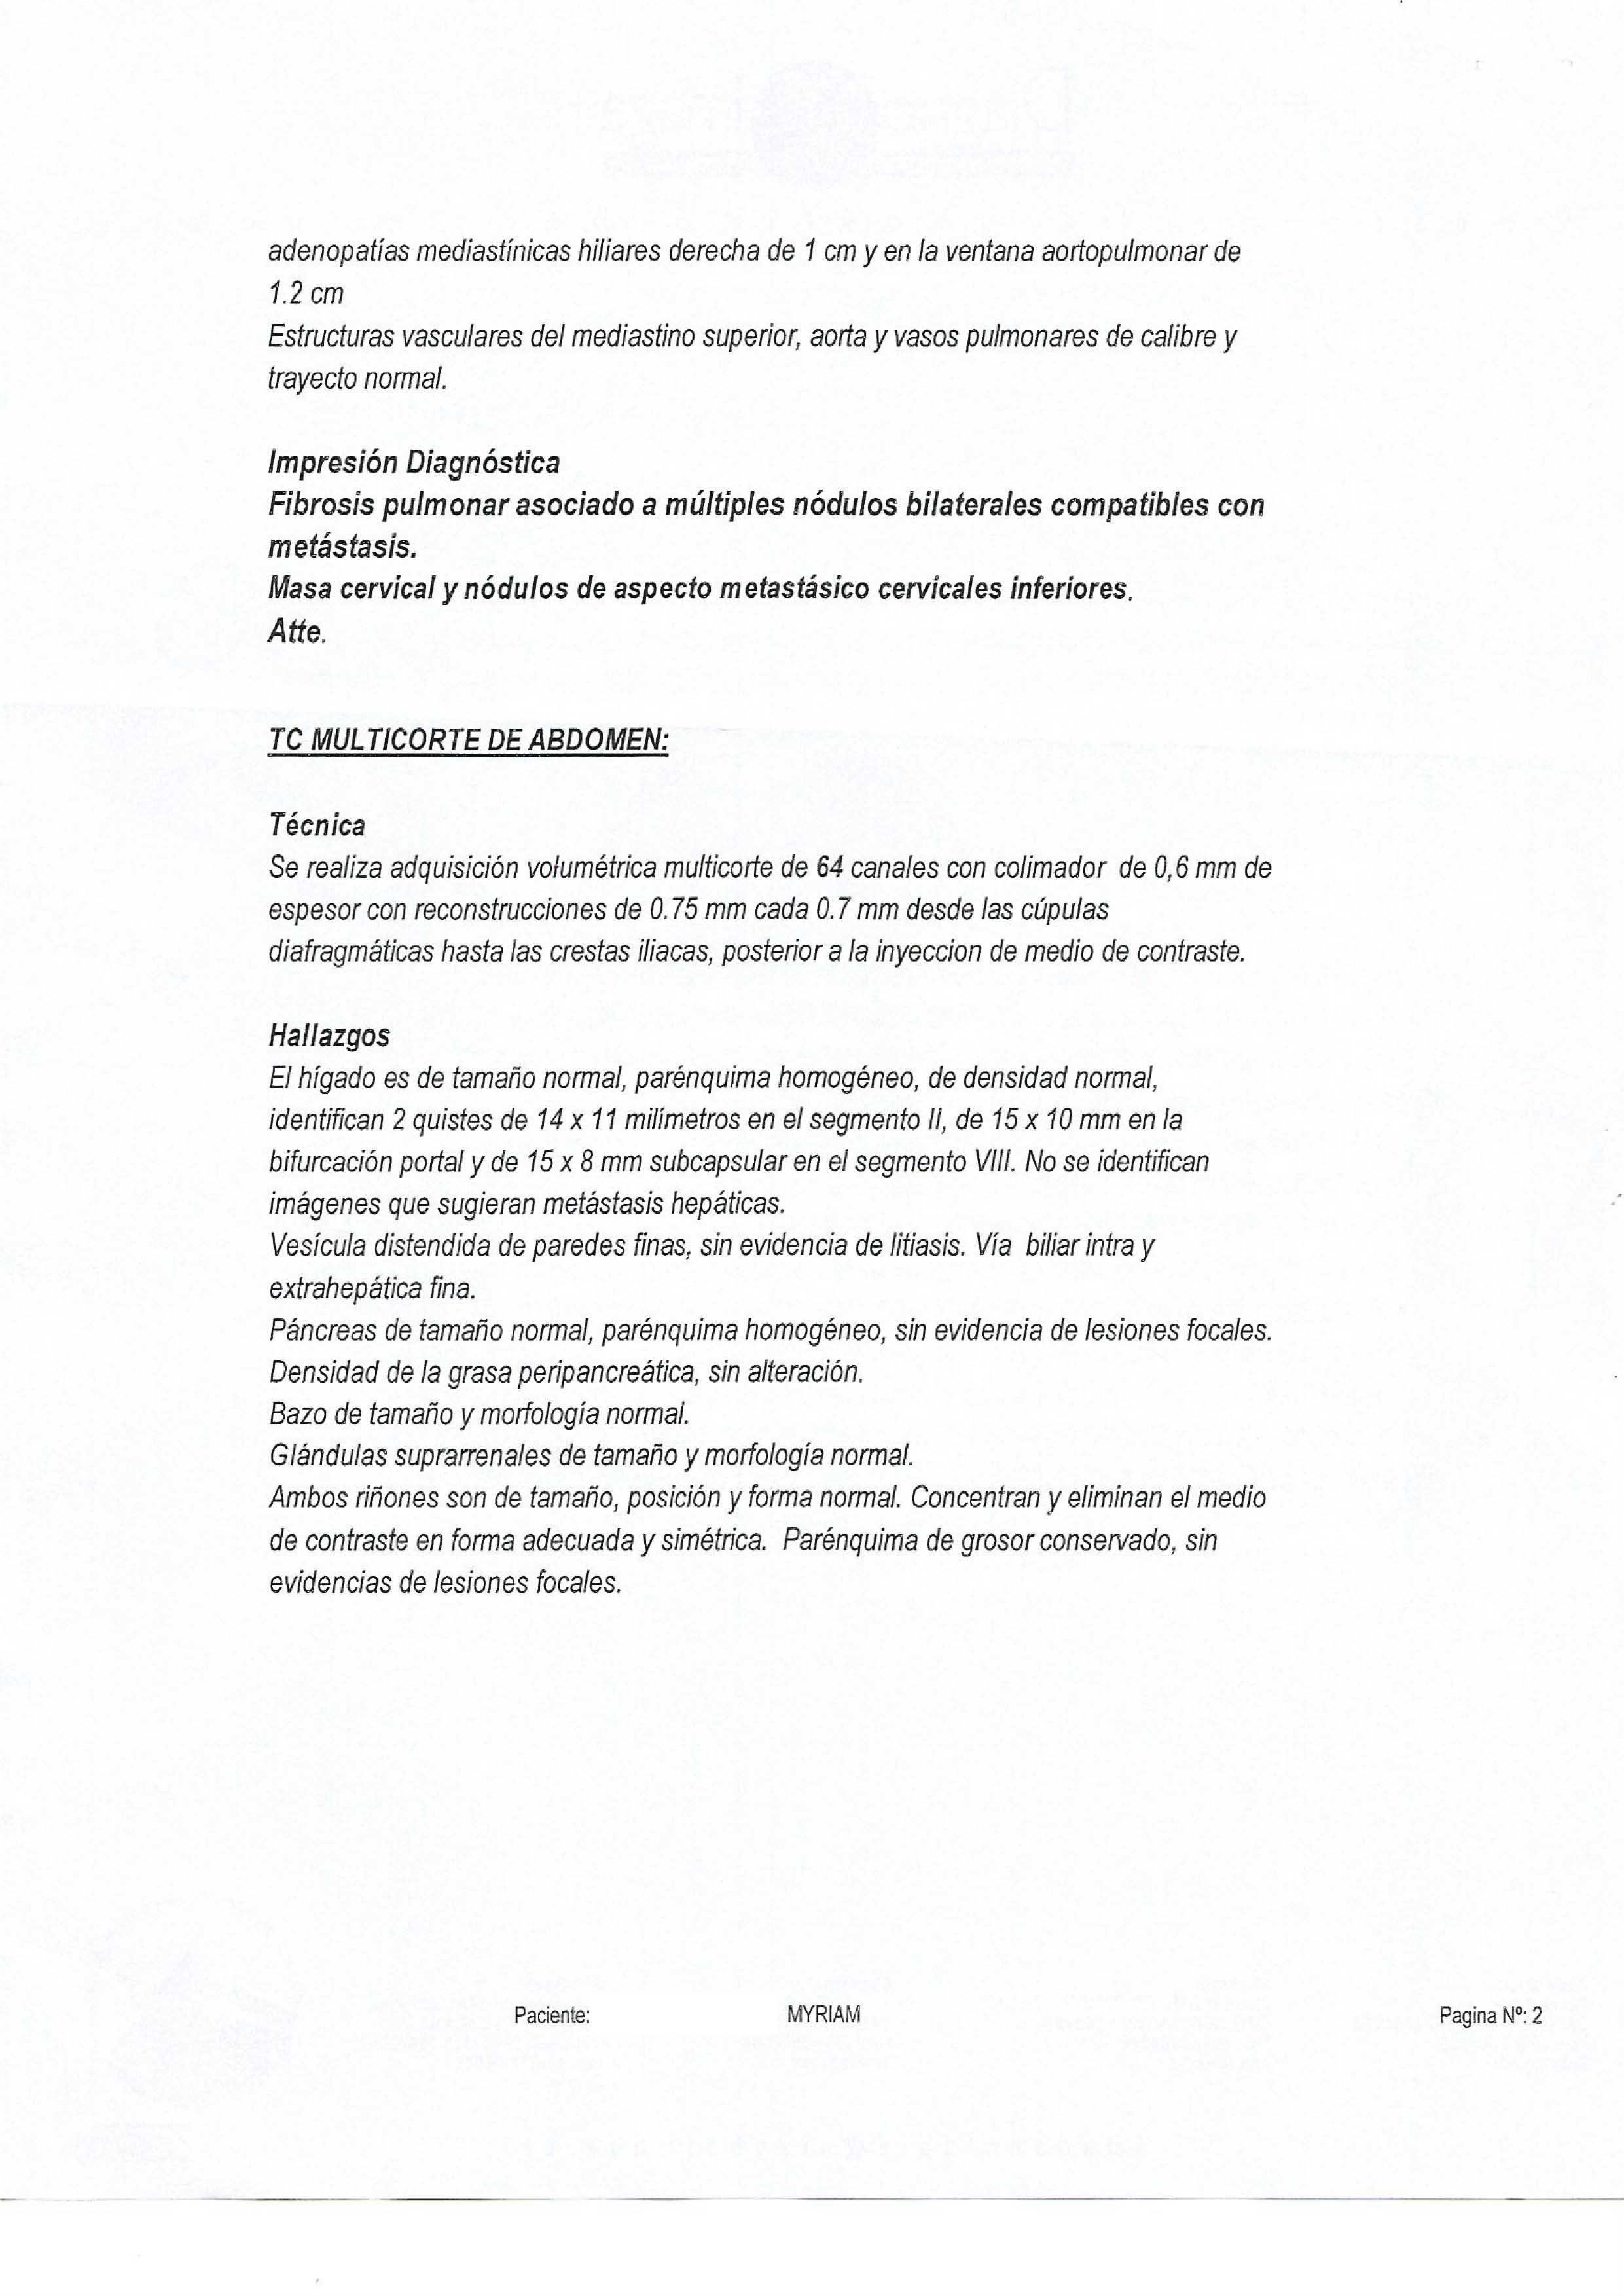 LifEscozul® - Miriam 12 - Cáncer de Pulmon